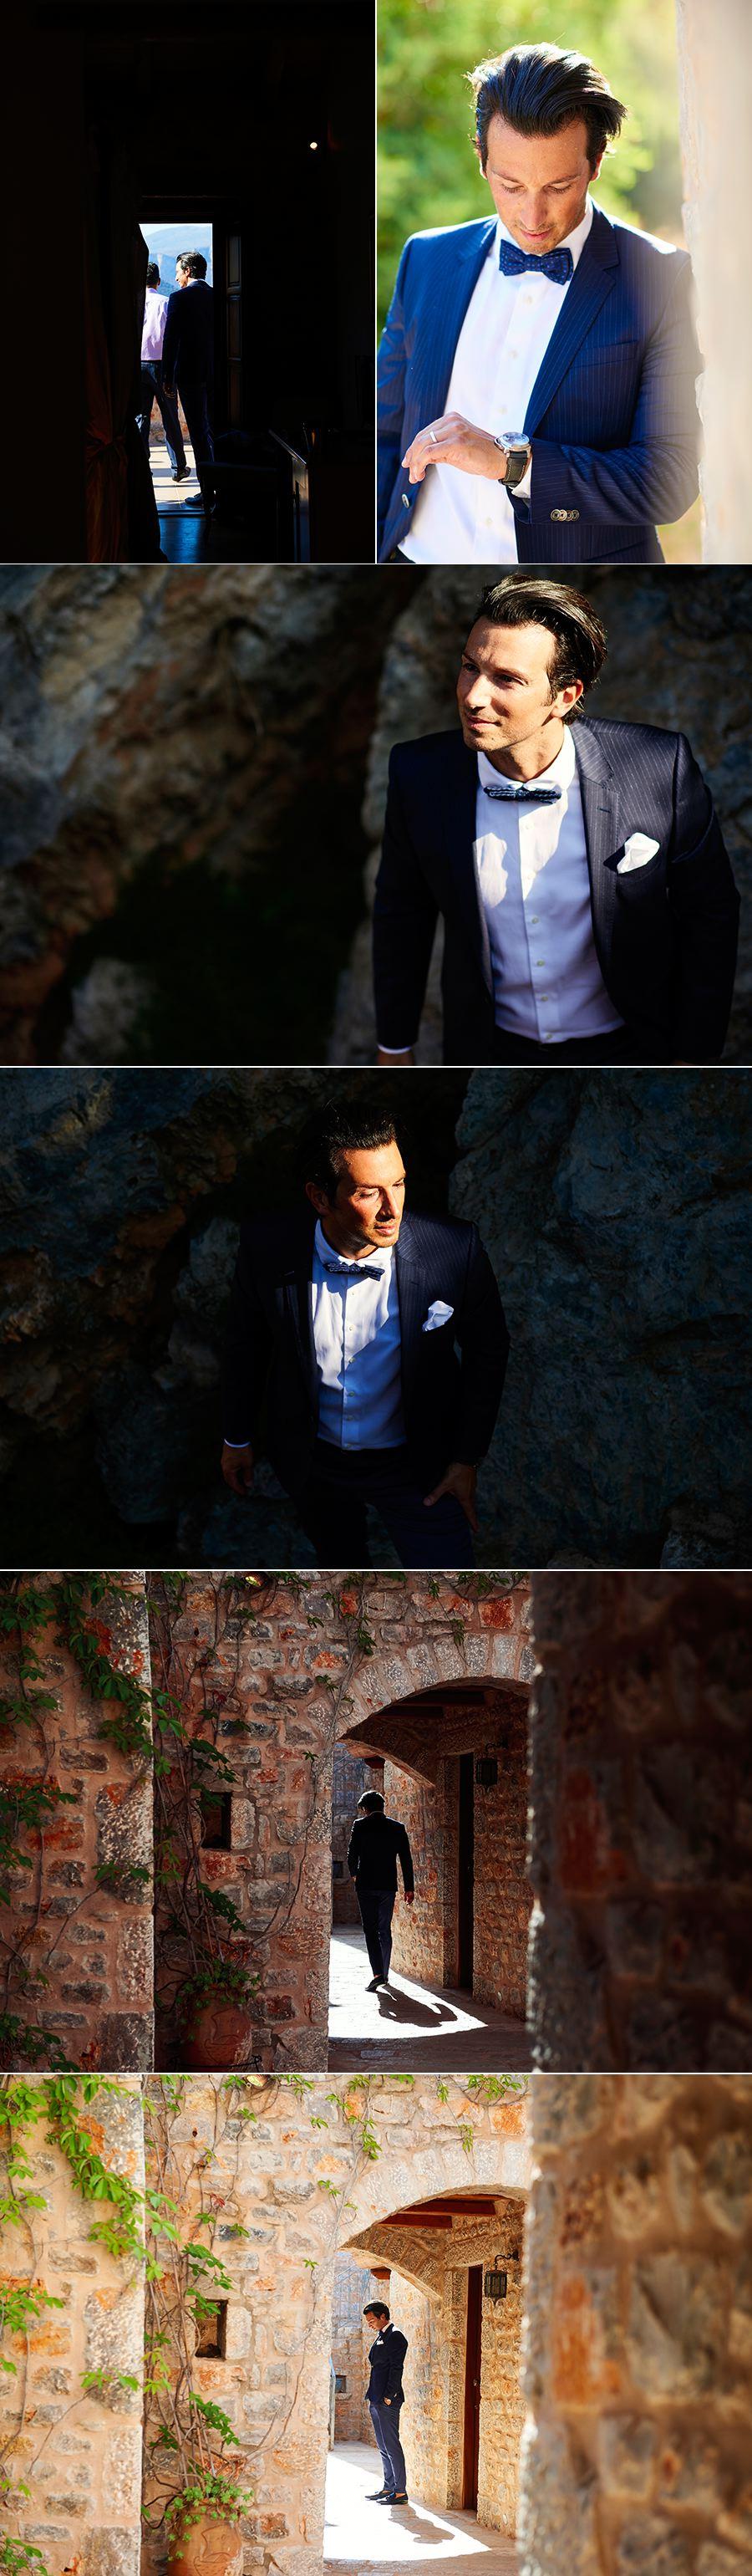 giannis-stella-wedding-photo-04